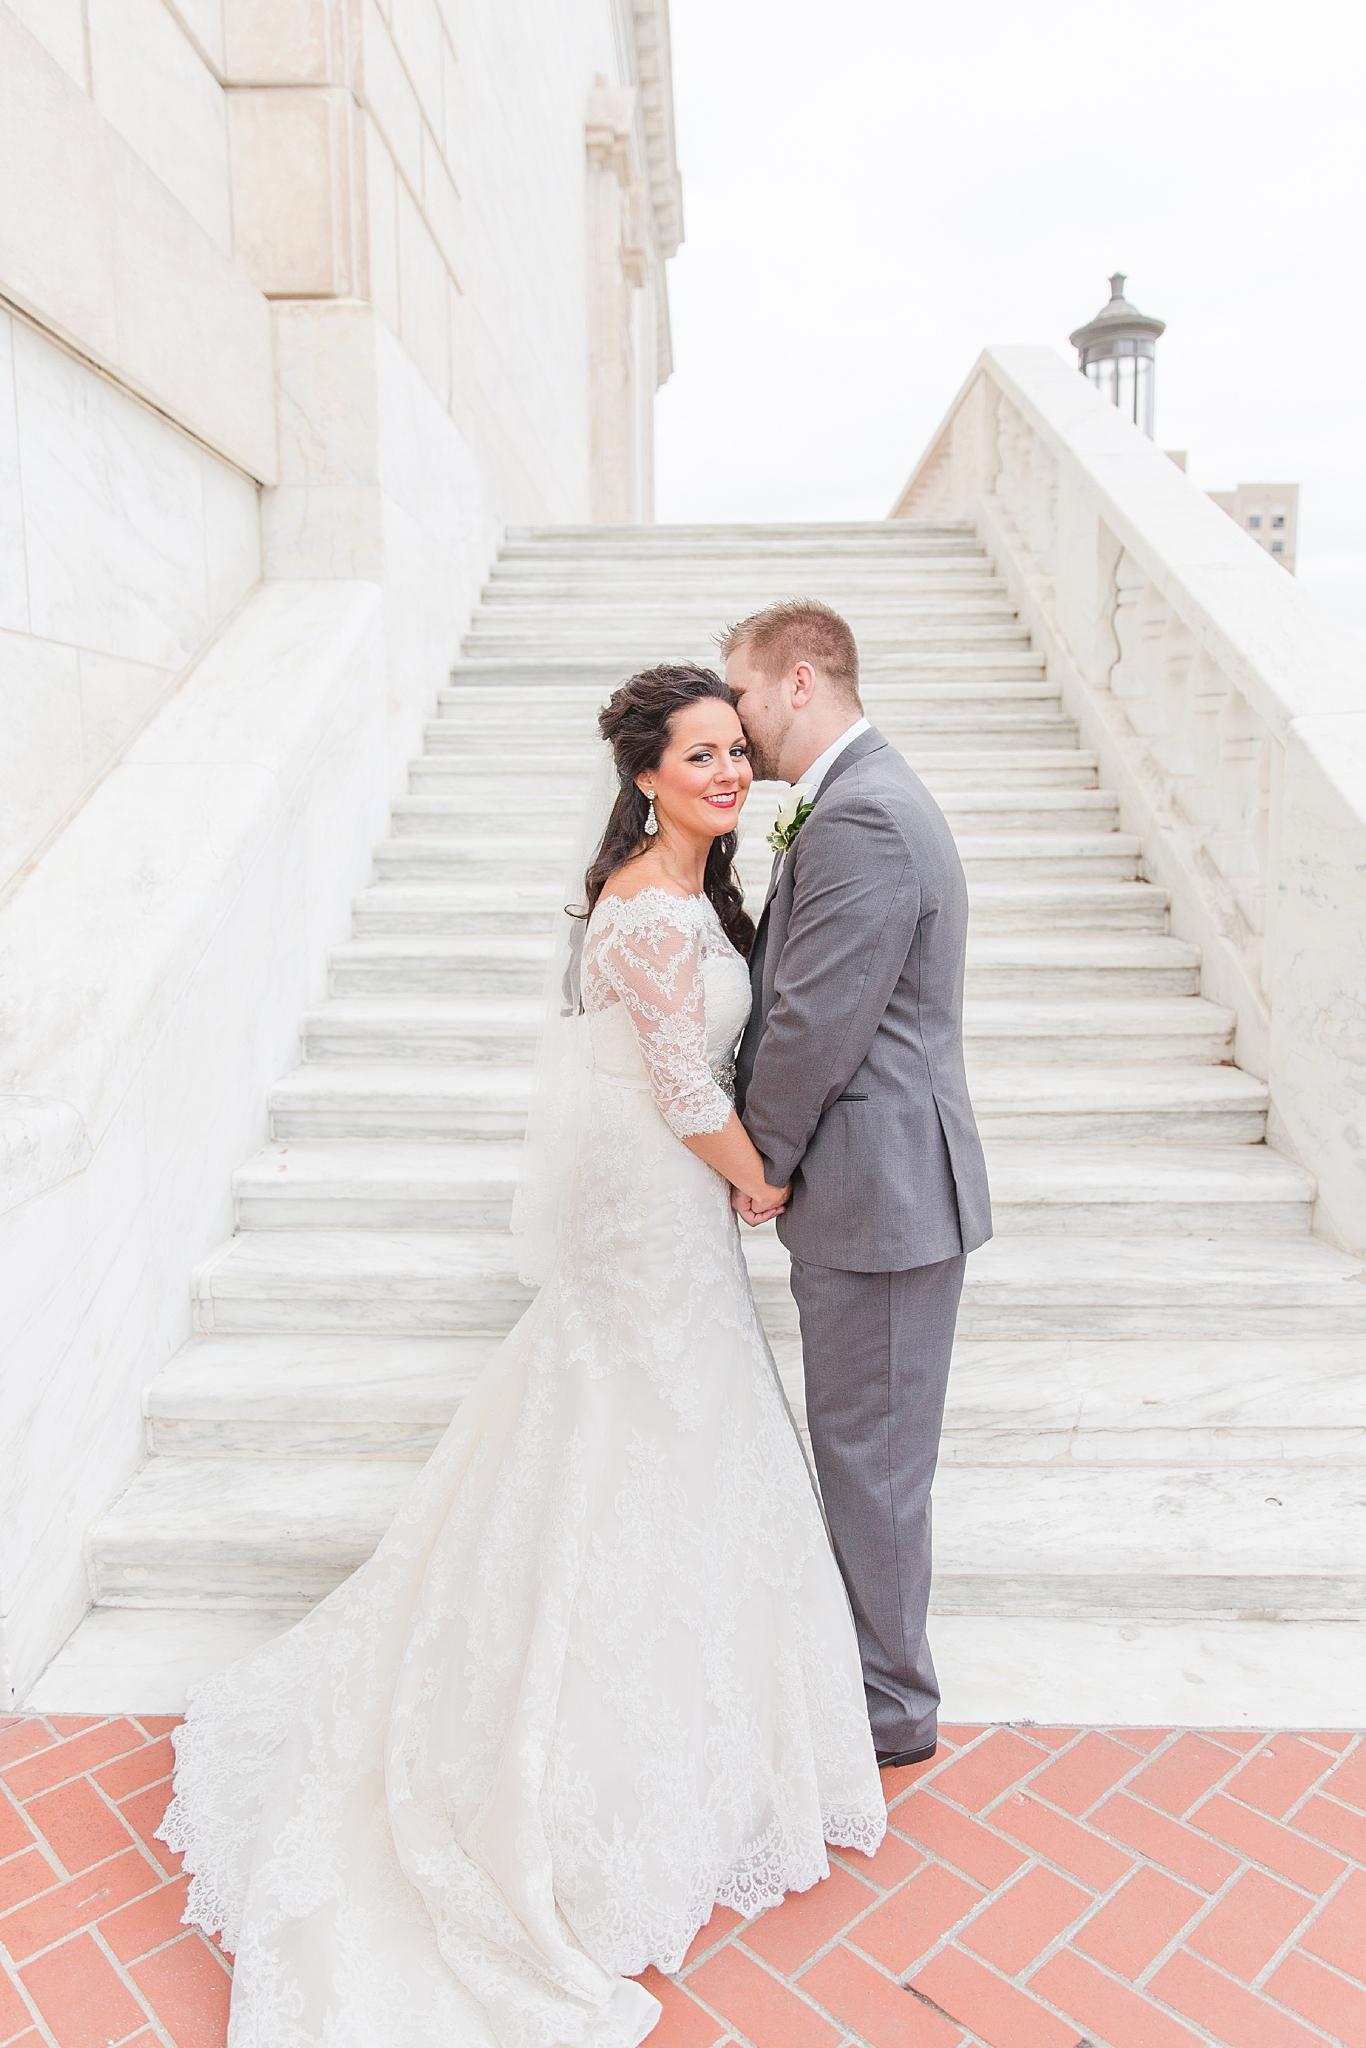 detroit-colony-club-wedding-regal-romantic-photography-in-detroit-mi-by-courtney-carolyn-photography_0017.jpg